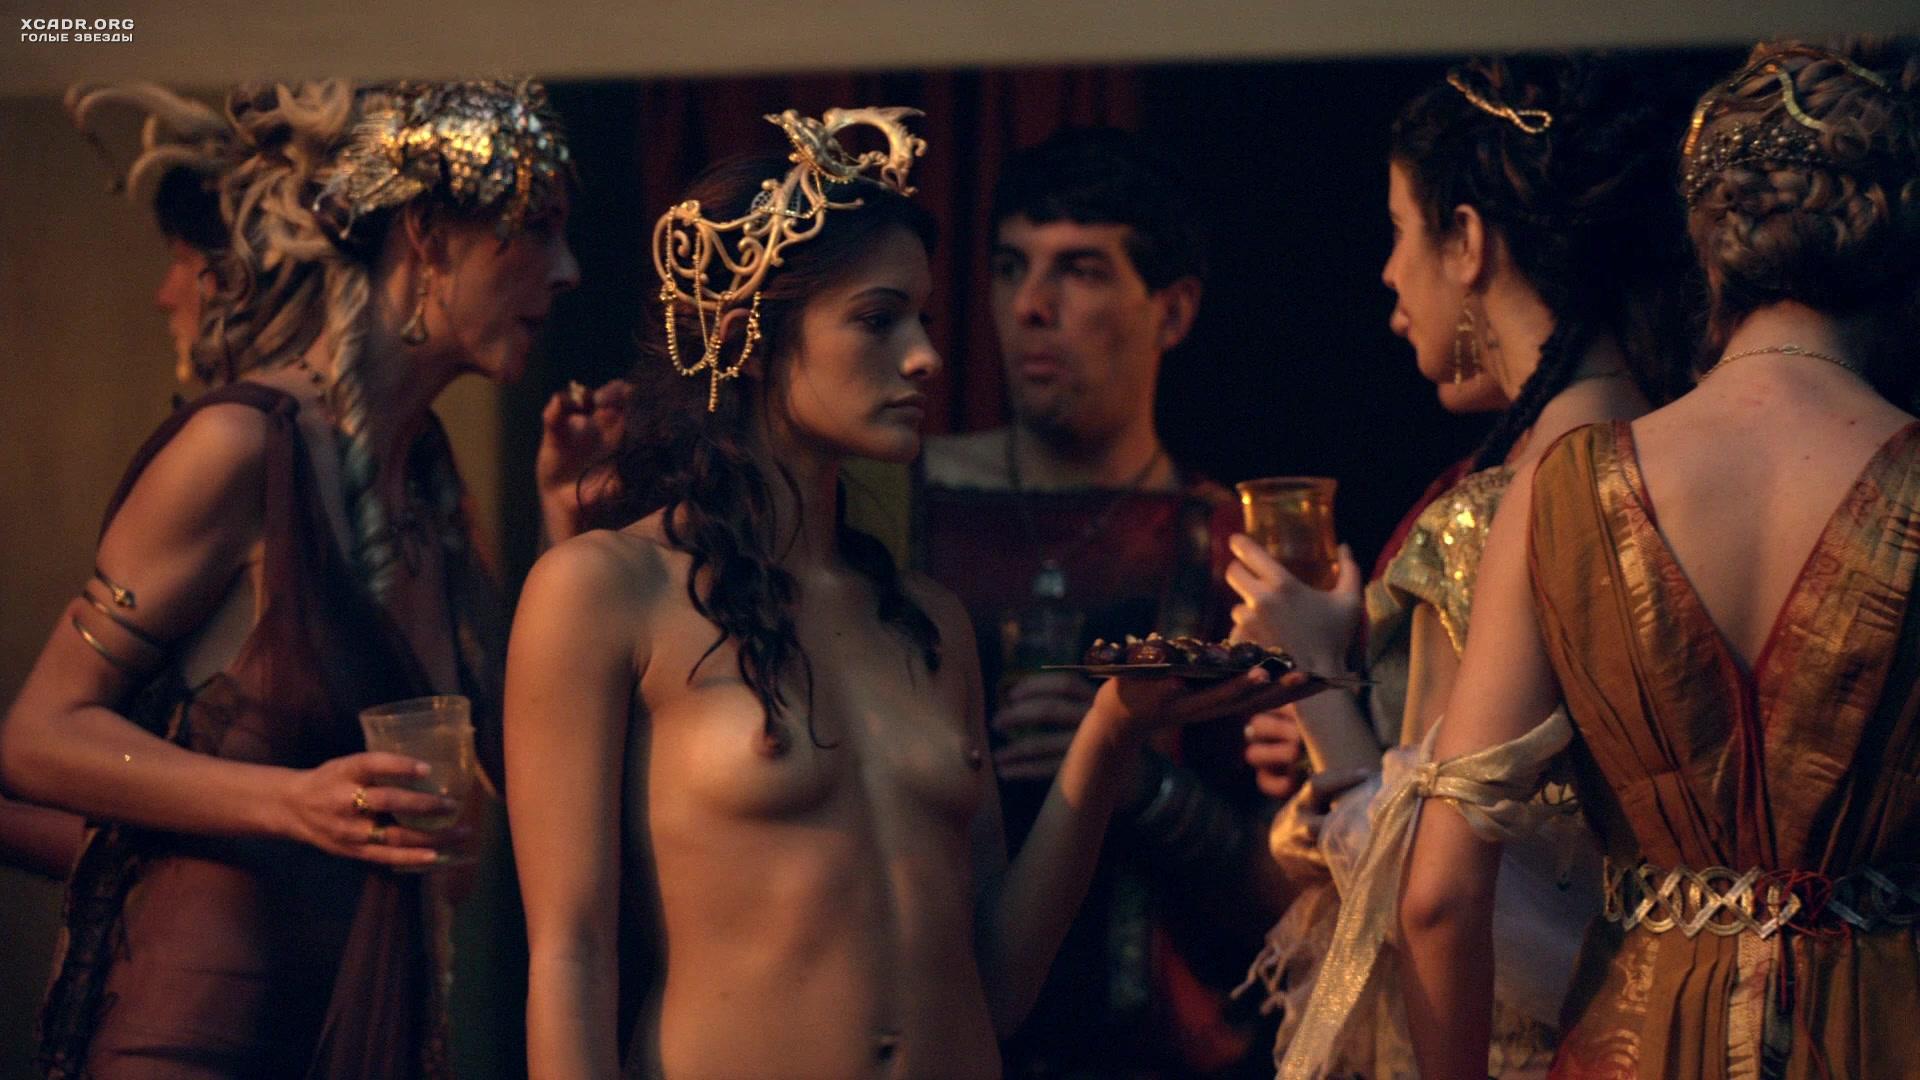 Roman orgy film